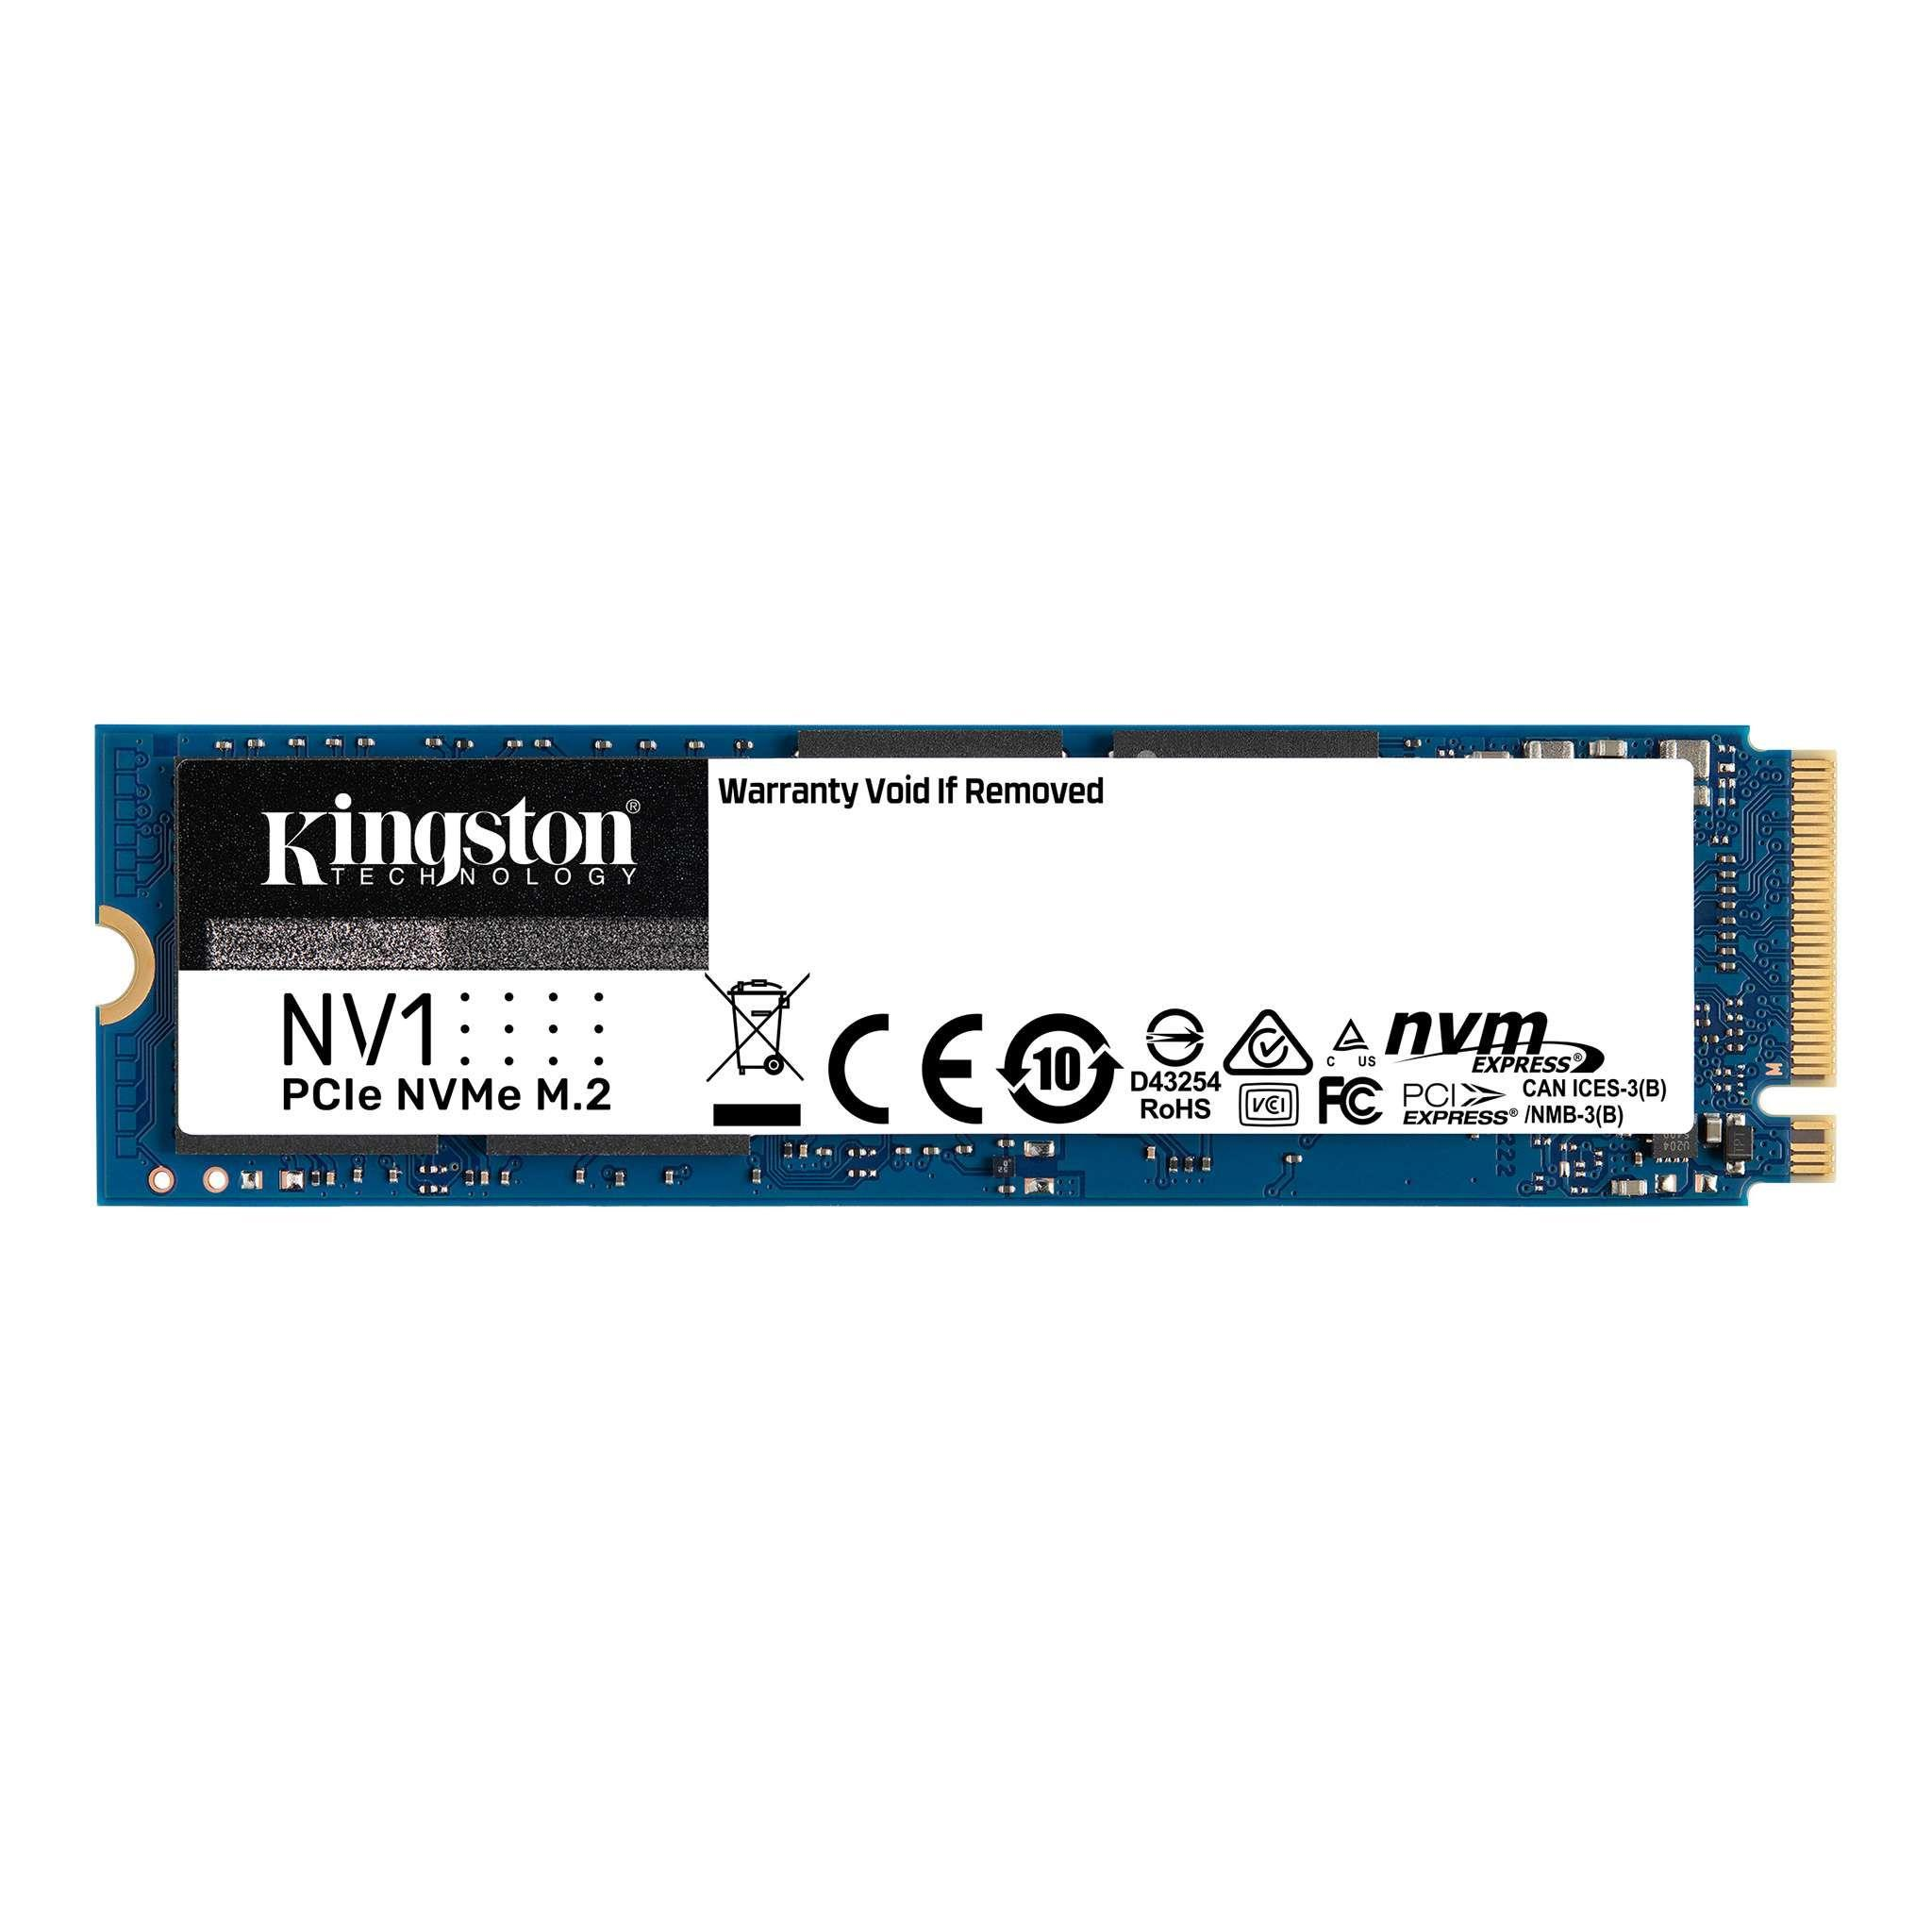 Dysk SSD Kingston NV1 500GB M.2 NVMe PCIe Gen 3.0 x4 (2100 1700 MB s) 2280